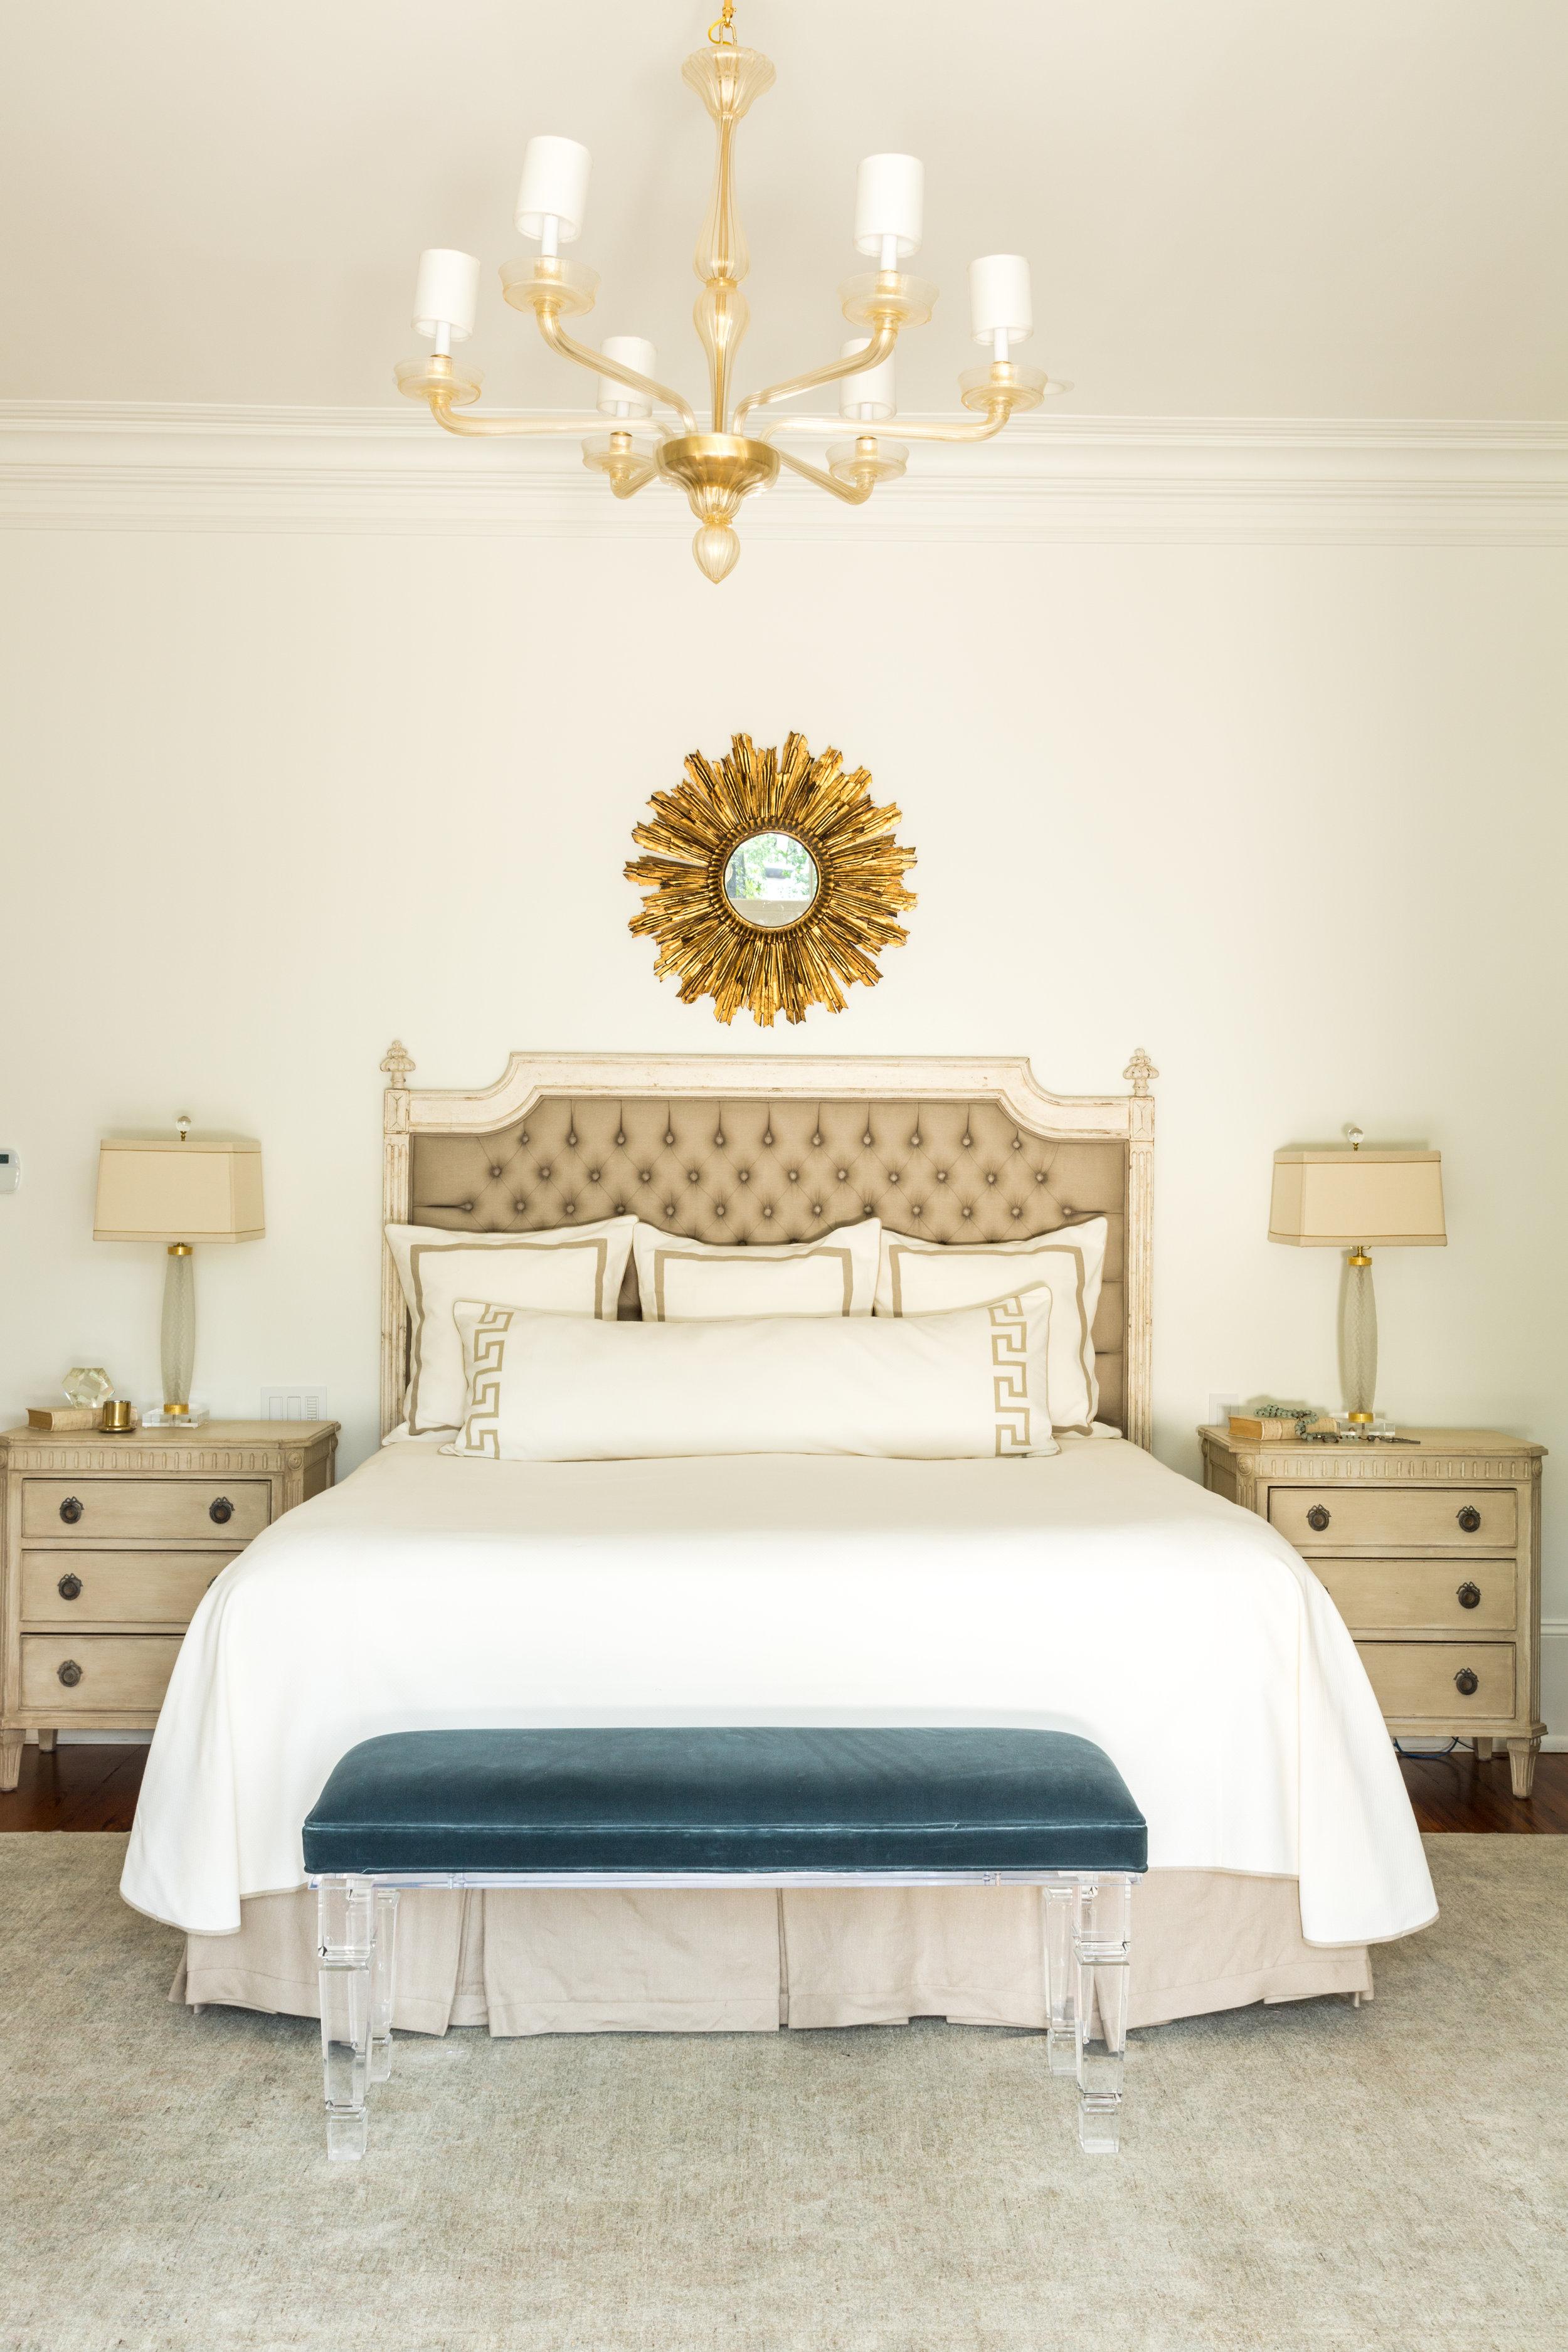 Gutterman_master bed-9543.jpg